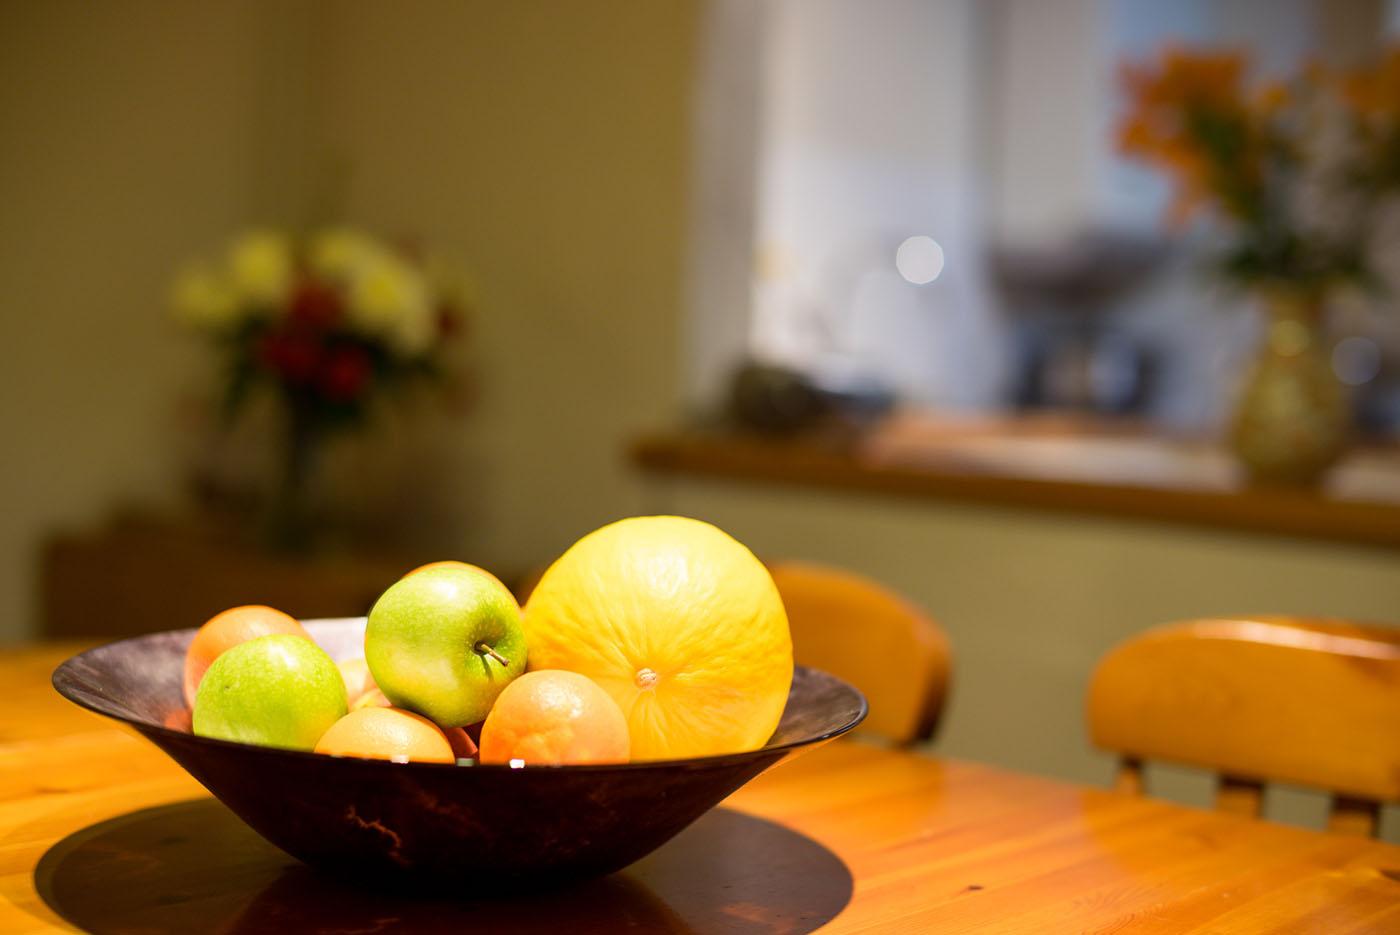 Granary bowl of fruit